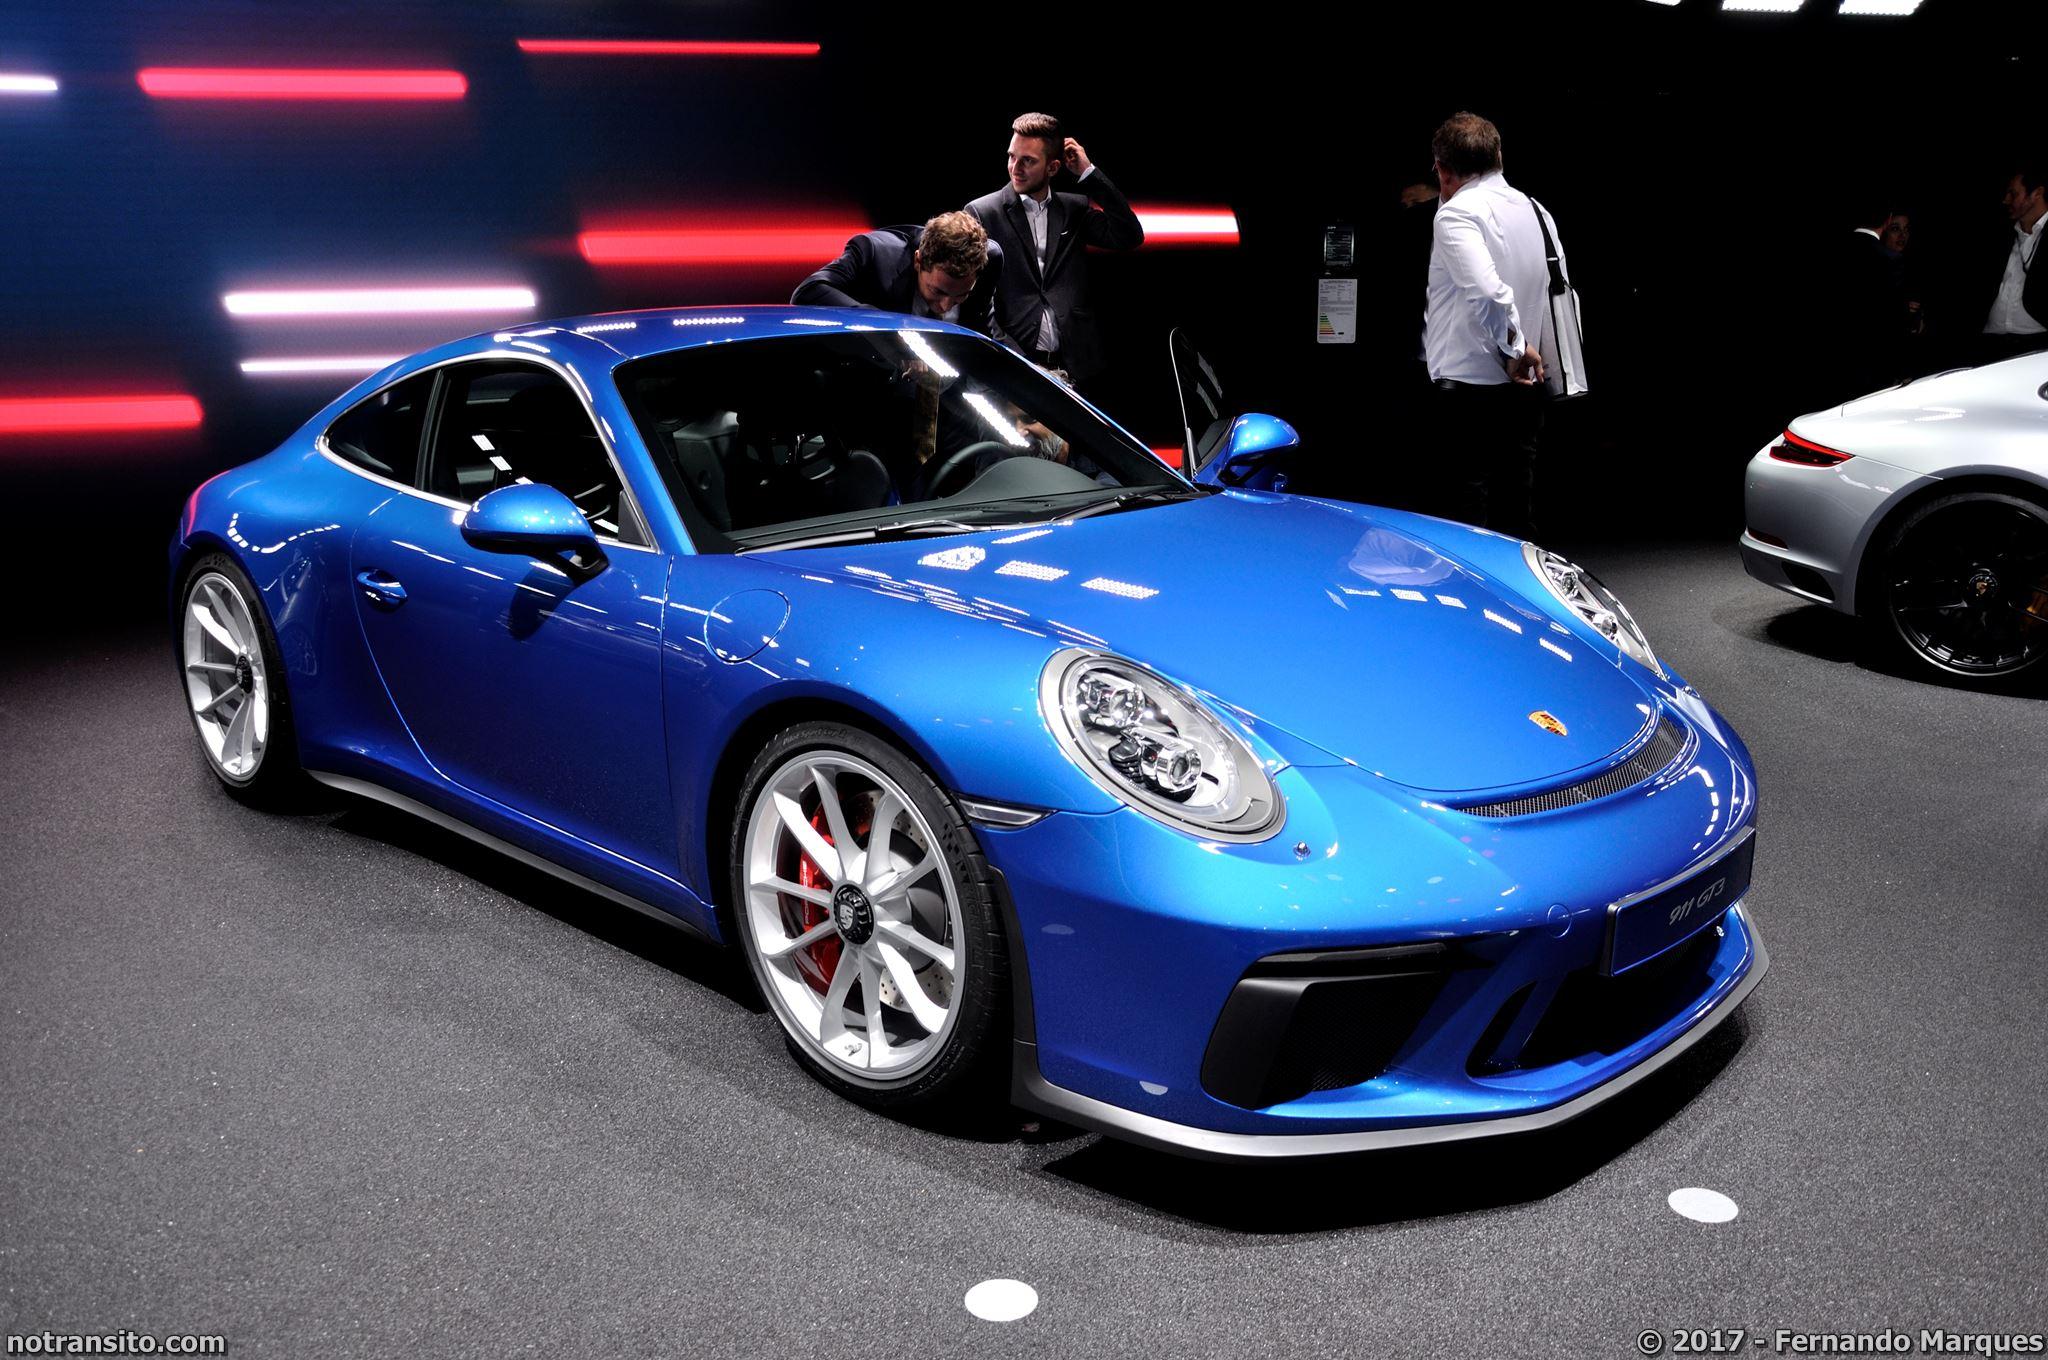 Porsche-911-GT3-Touring-Package-Frankfurt-2017-002